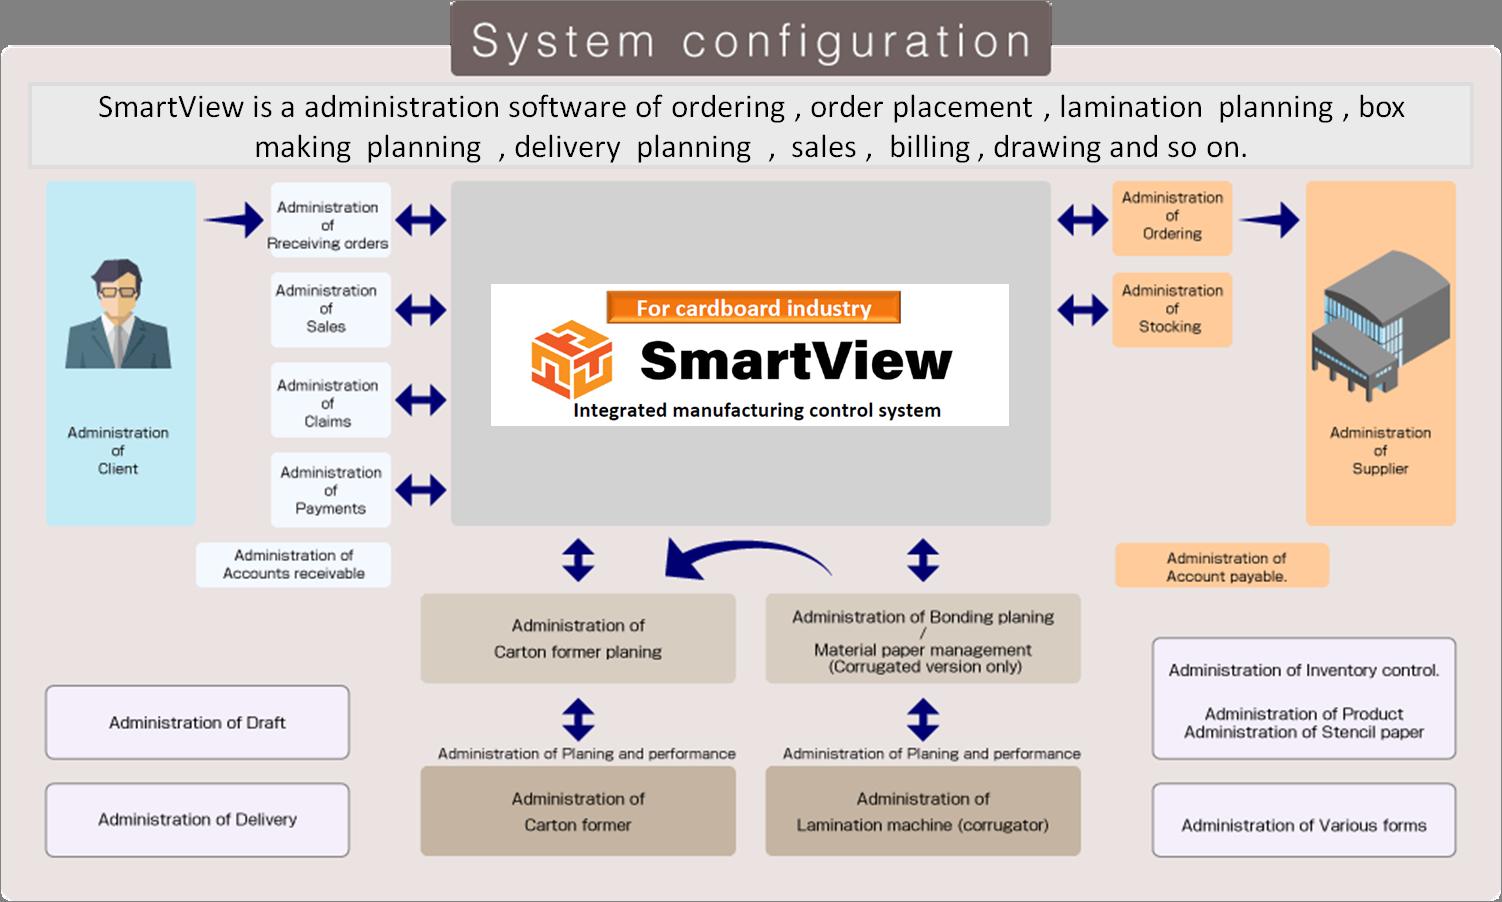 SmartView system configuration